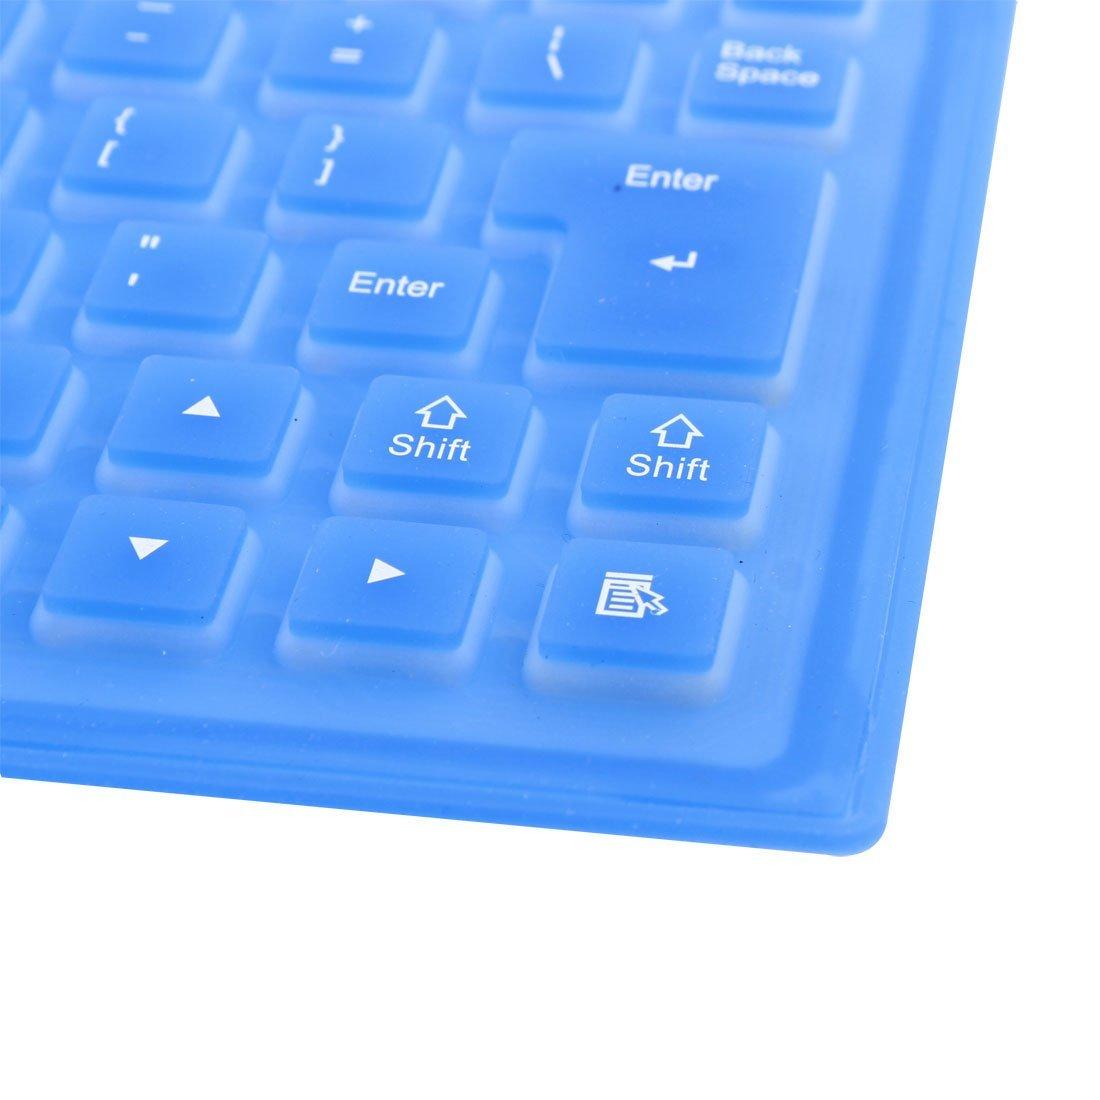 Amazon.com: eDealMax plegables Flexibles 85 Llaves USB Con Cable Enrolle teclado de silicona Azul Para el ordenador portátil PC portátil: Electronics